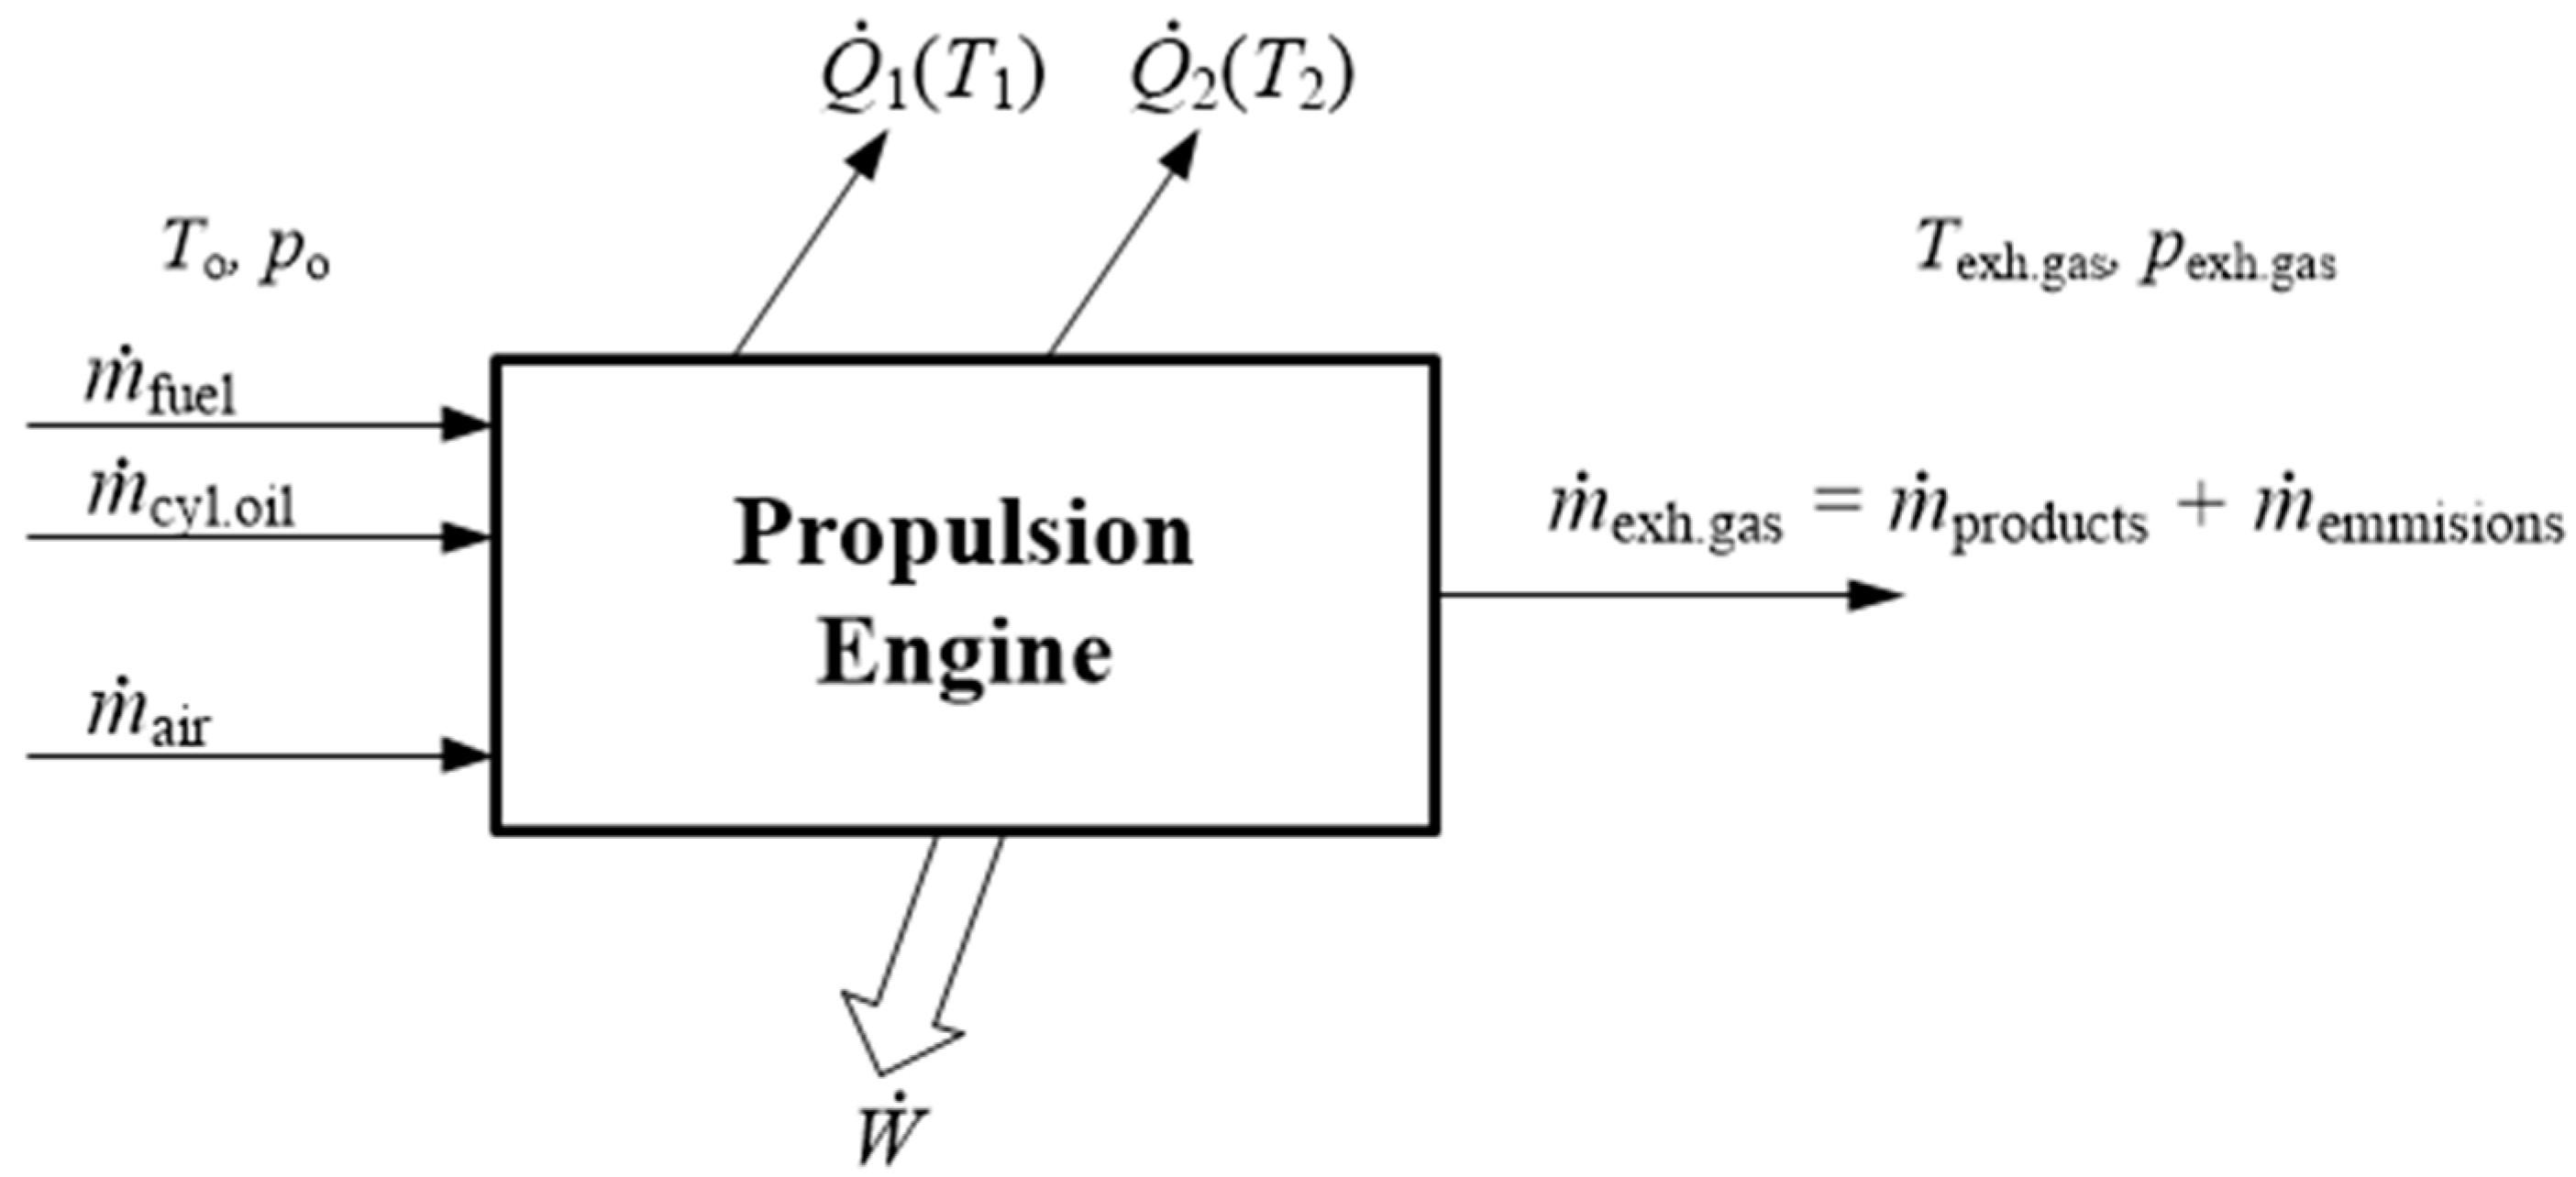 Valve Timing Diagram for Four Stroke Engine Energies Free Full Text Of Valve Timing Diagram for Four Stroke Engine